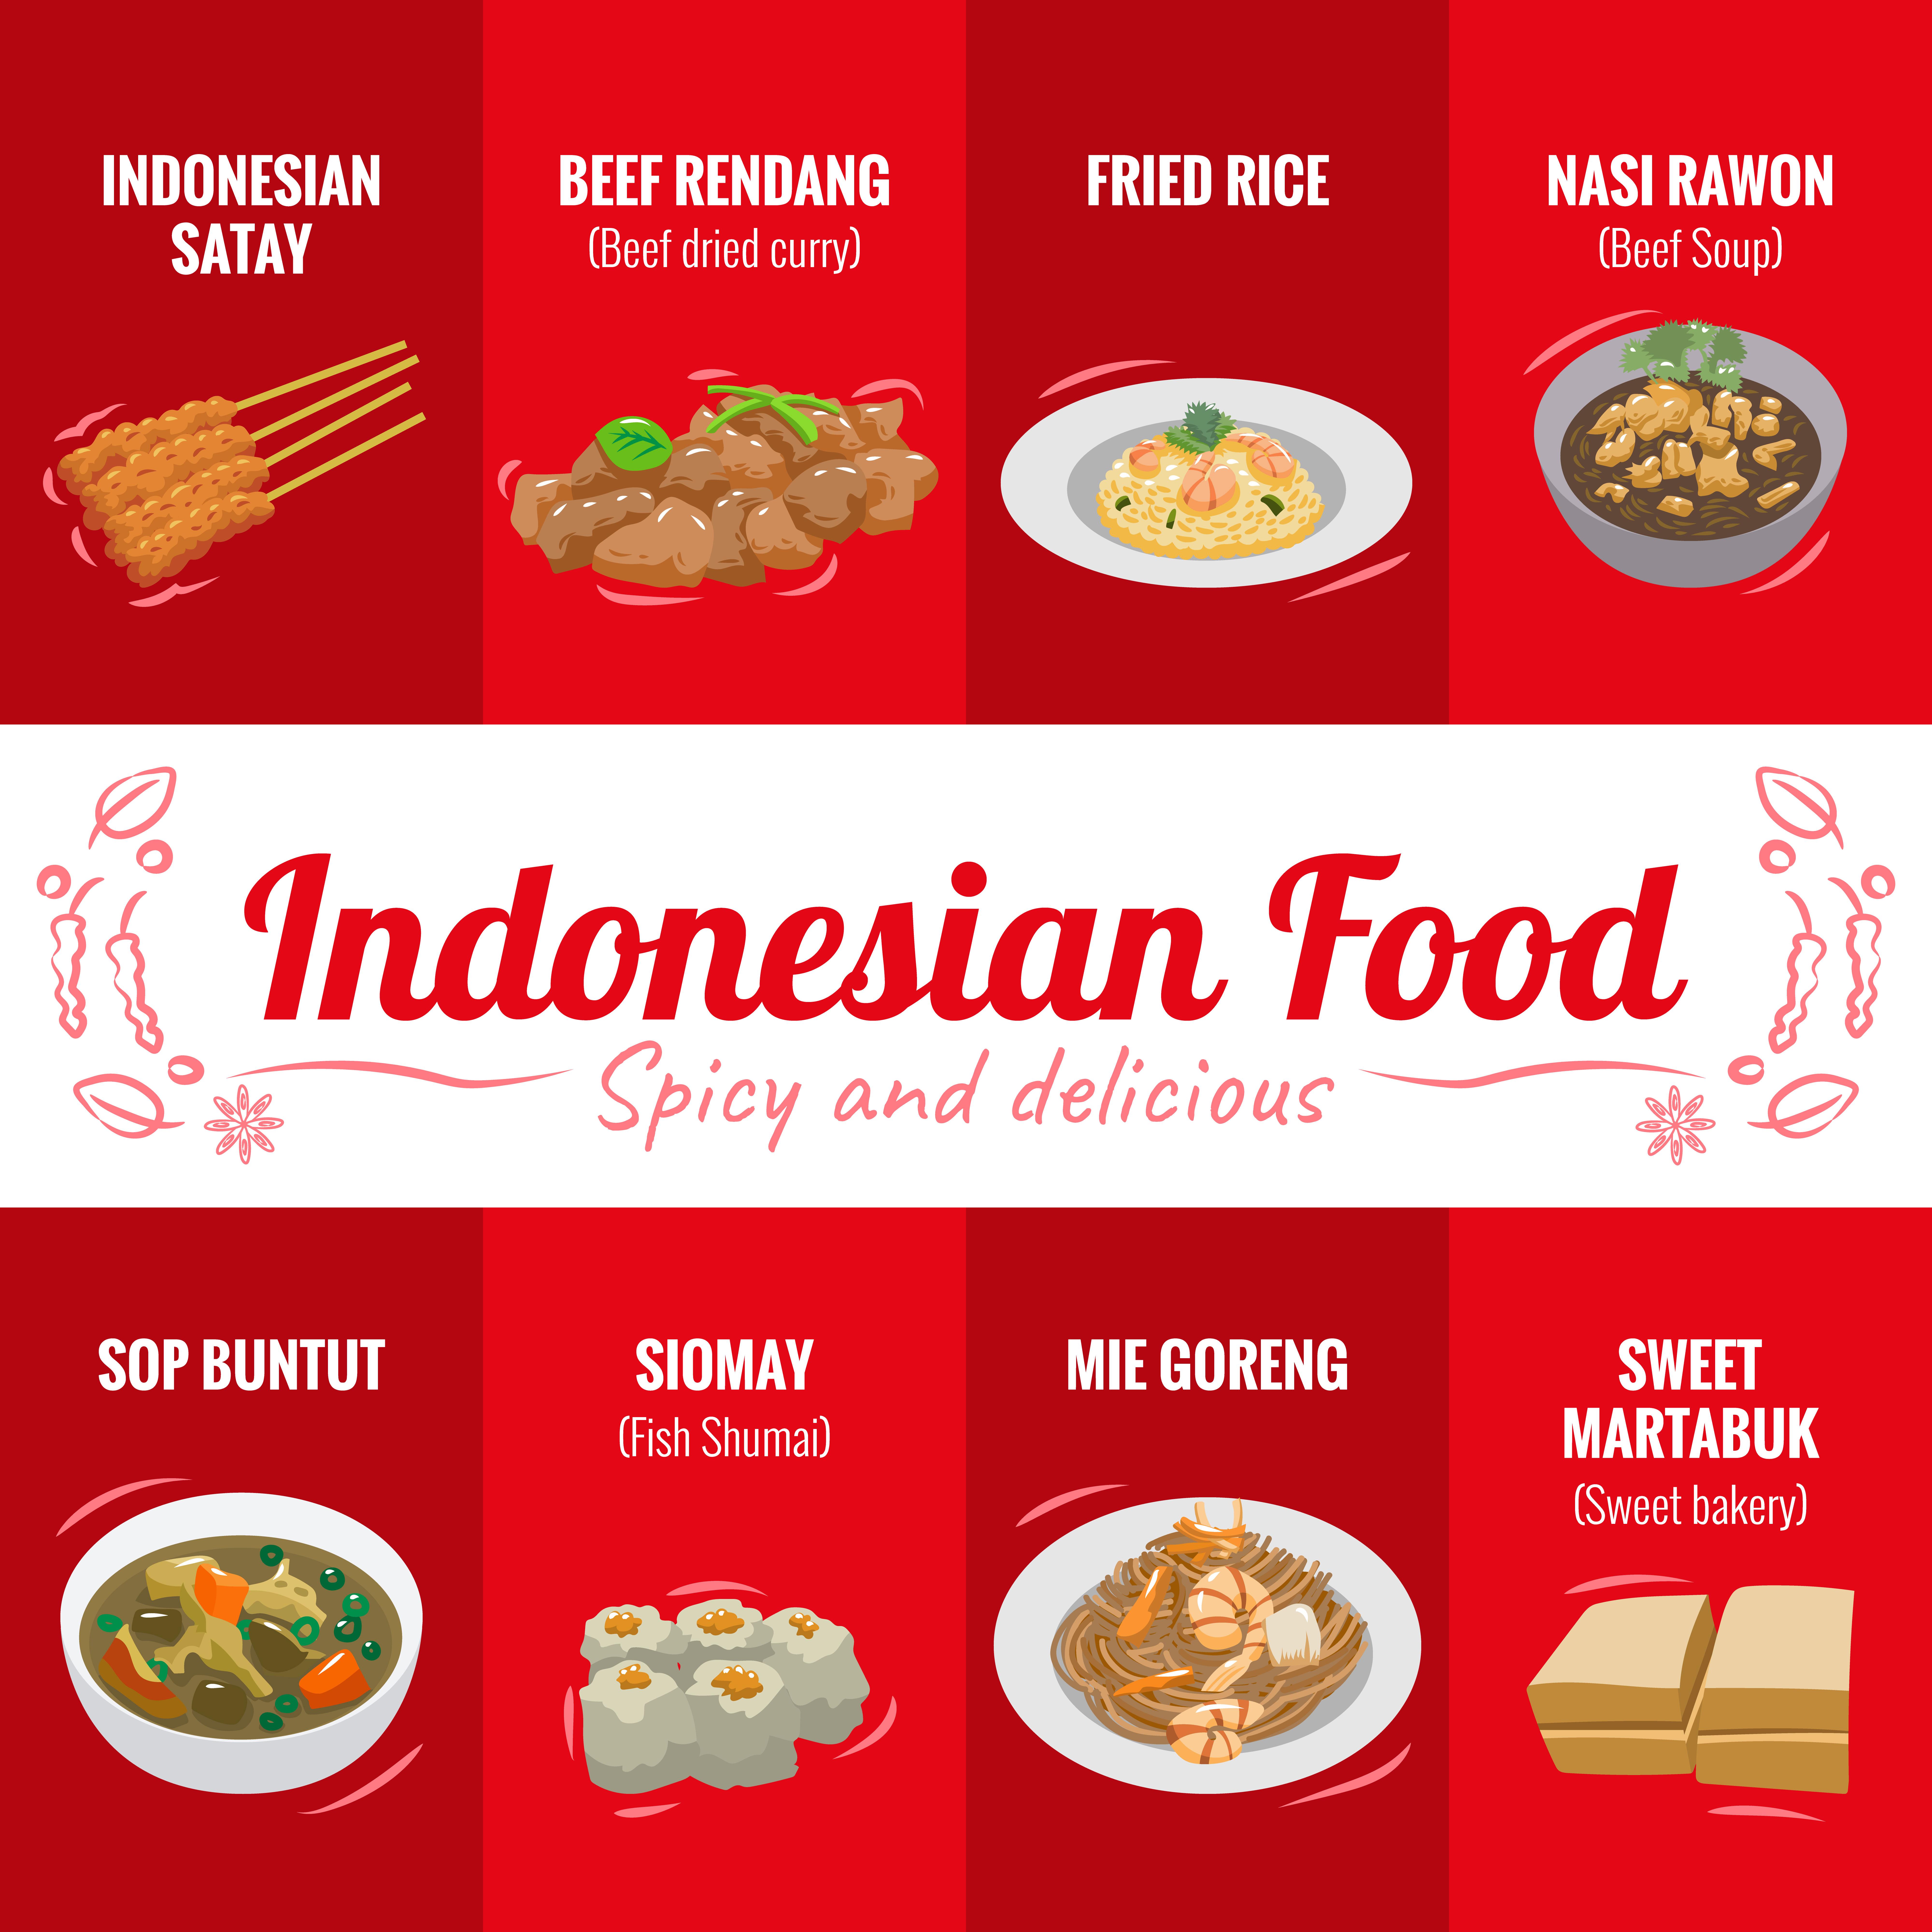 Indonesian Cuisine History